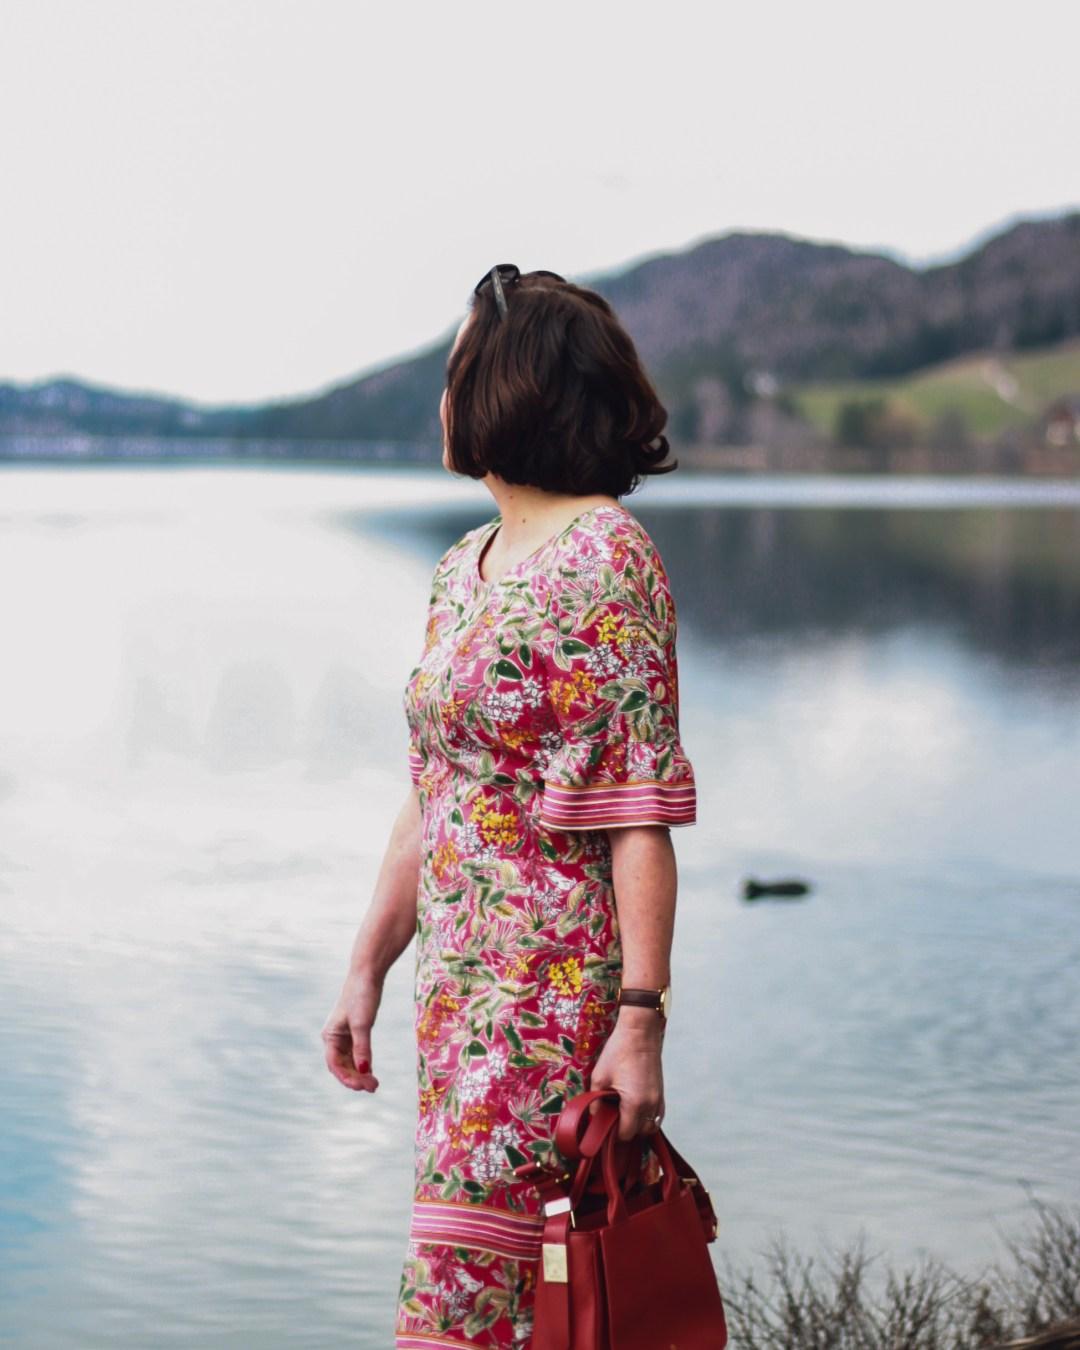 inastil, peterhahn, utaraasch, Frühlingsmode, Kleid, Ü50Mode, Modeberatung, Stilberatung, Frühling2019, Sommerkleid, Seidenkleid-12